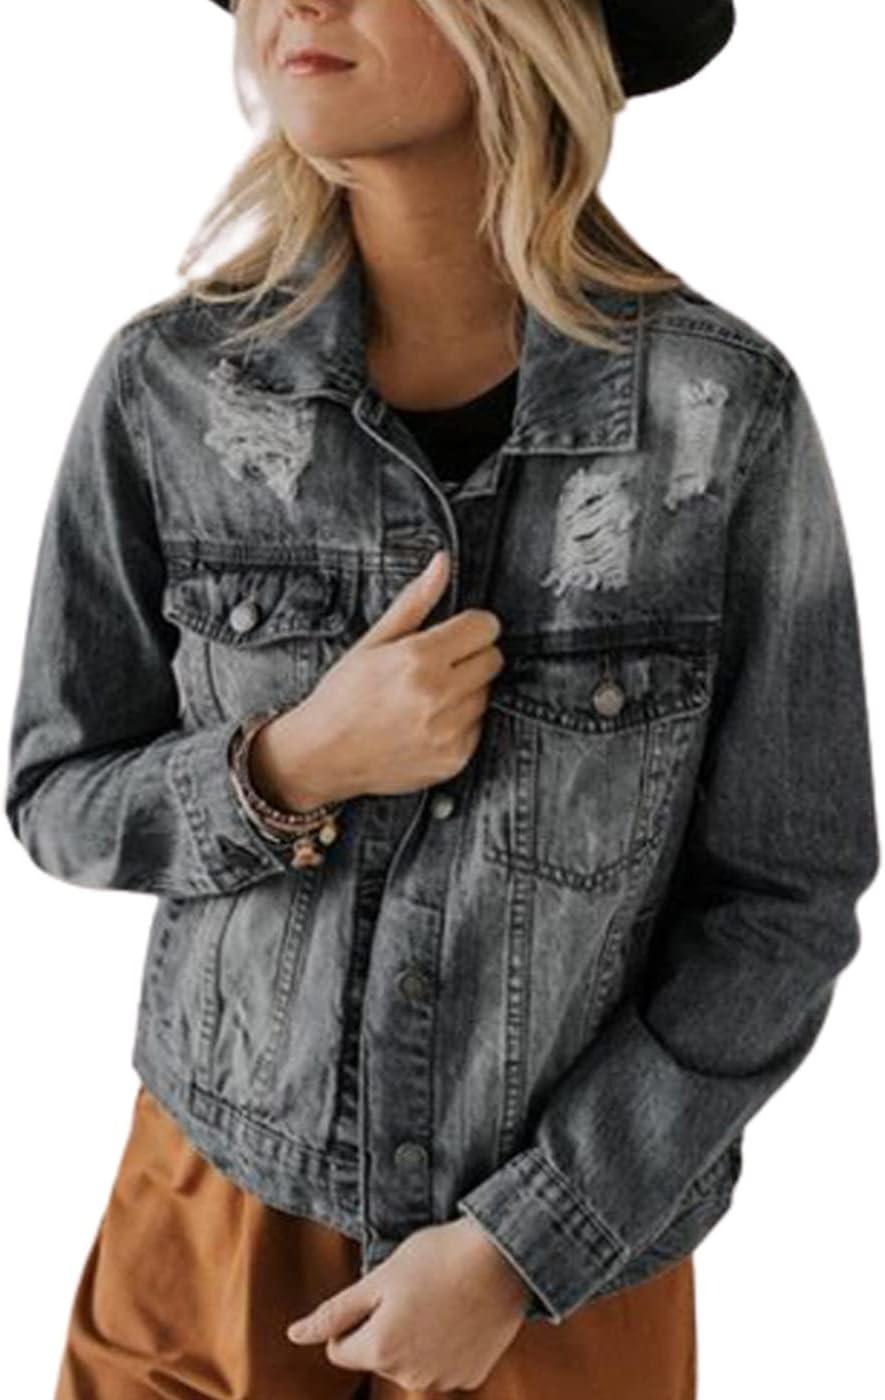 WanXingLiHe Ripped Lapel Jean Jacket for Women, Slim Casual Blue Denim Coats Outwear Fashion Clothing,Gray,3XL